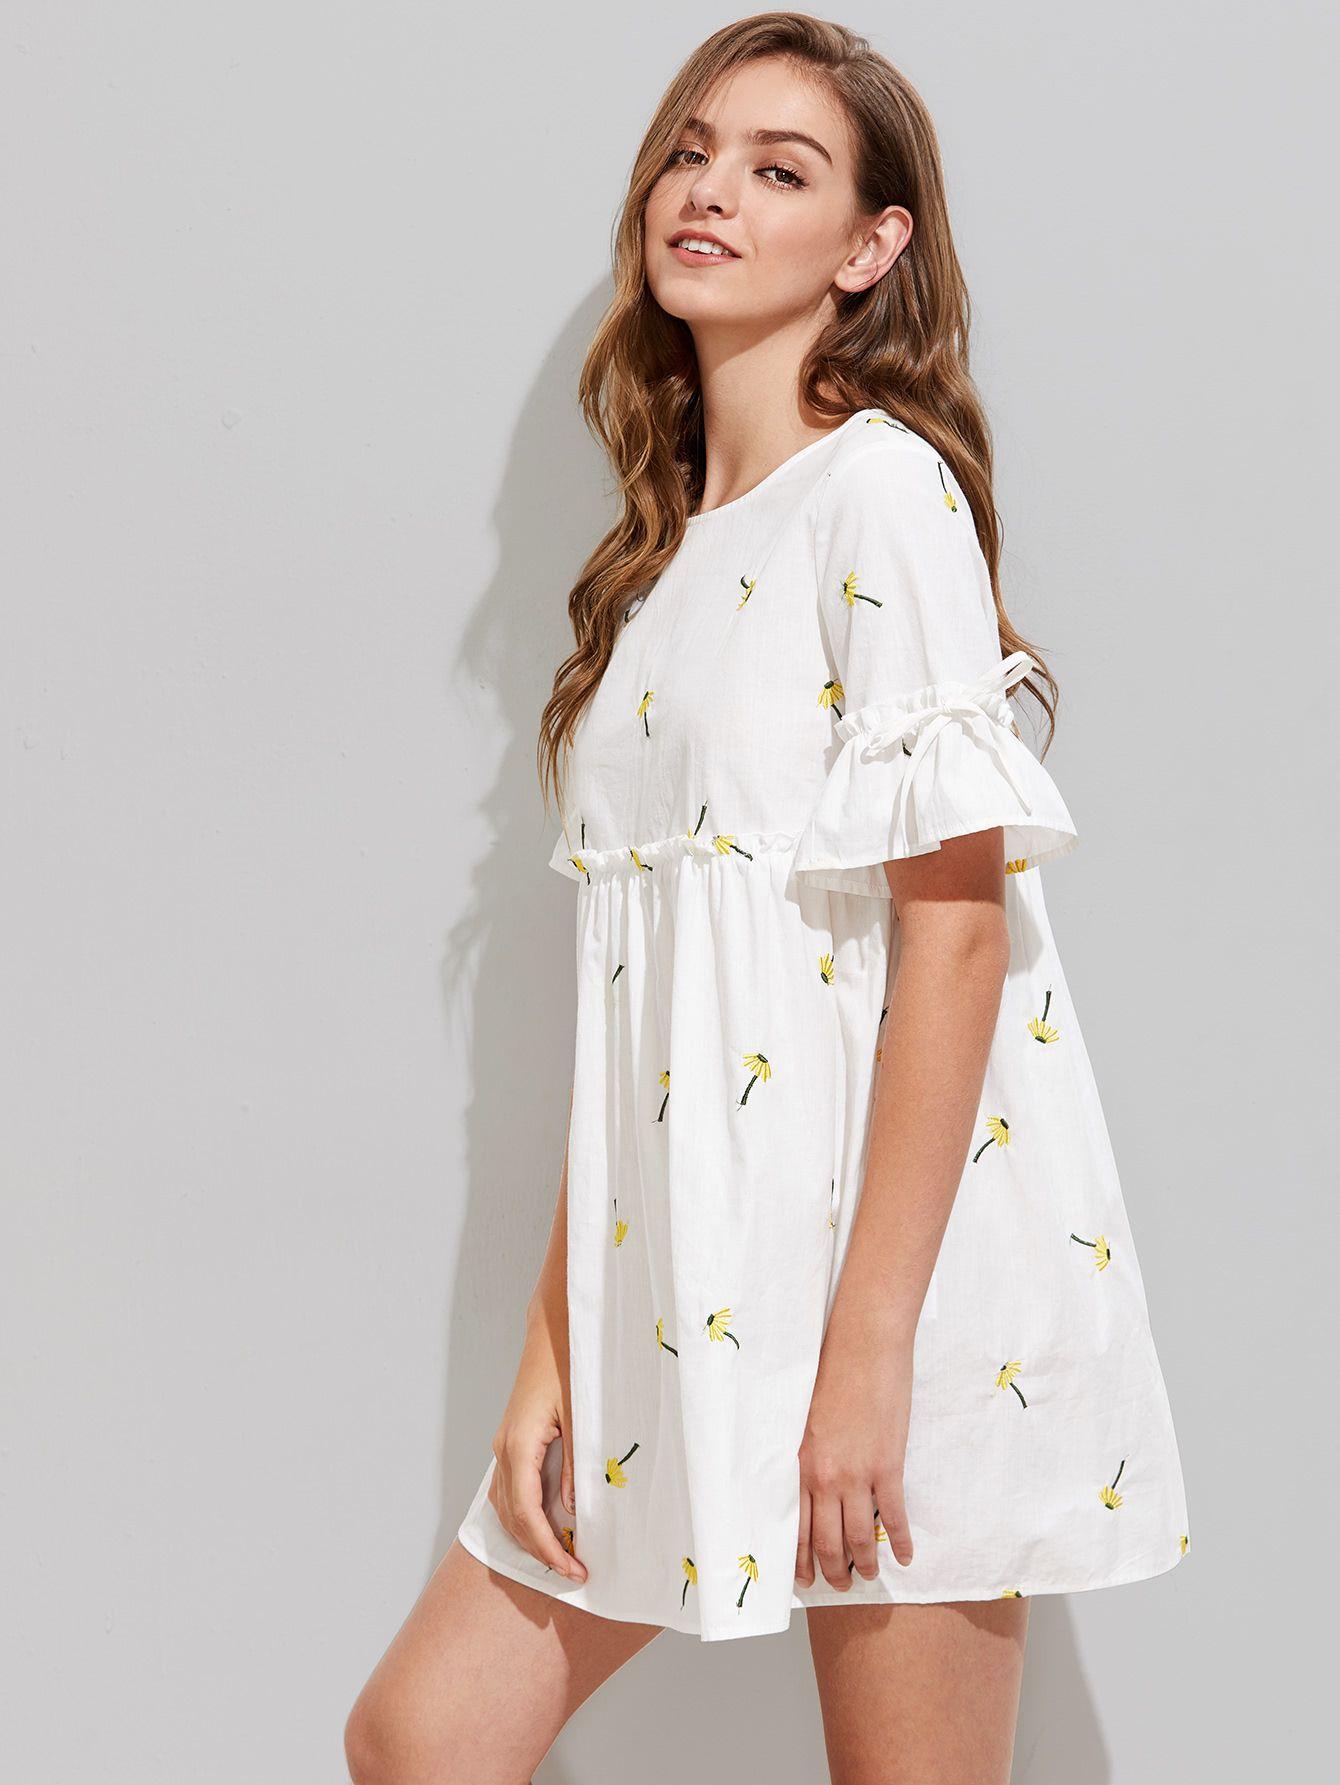 6c002f79516 Dandelion Embroidered Frilled Fluted Sleeve Babydoll Dress -SheIn ...